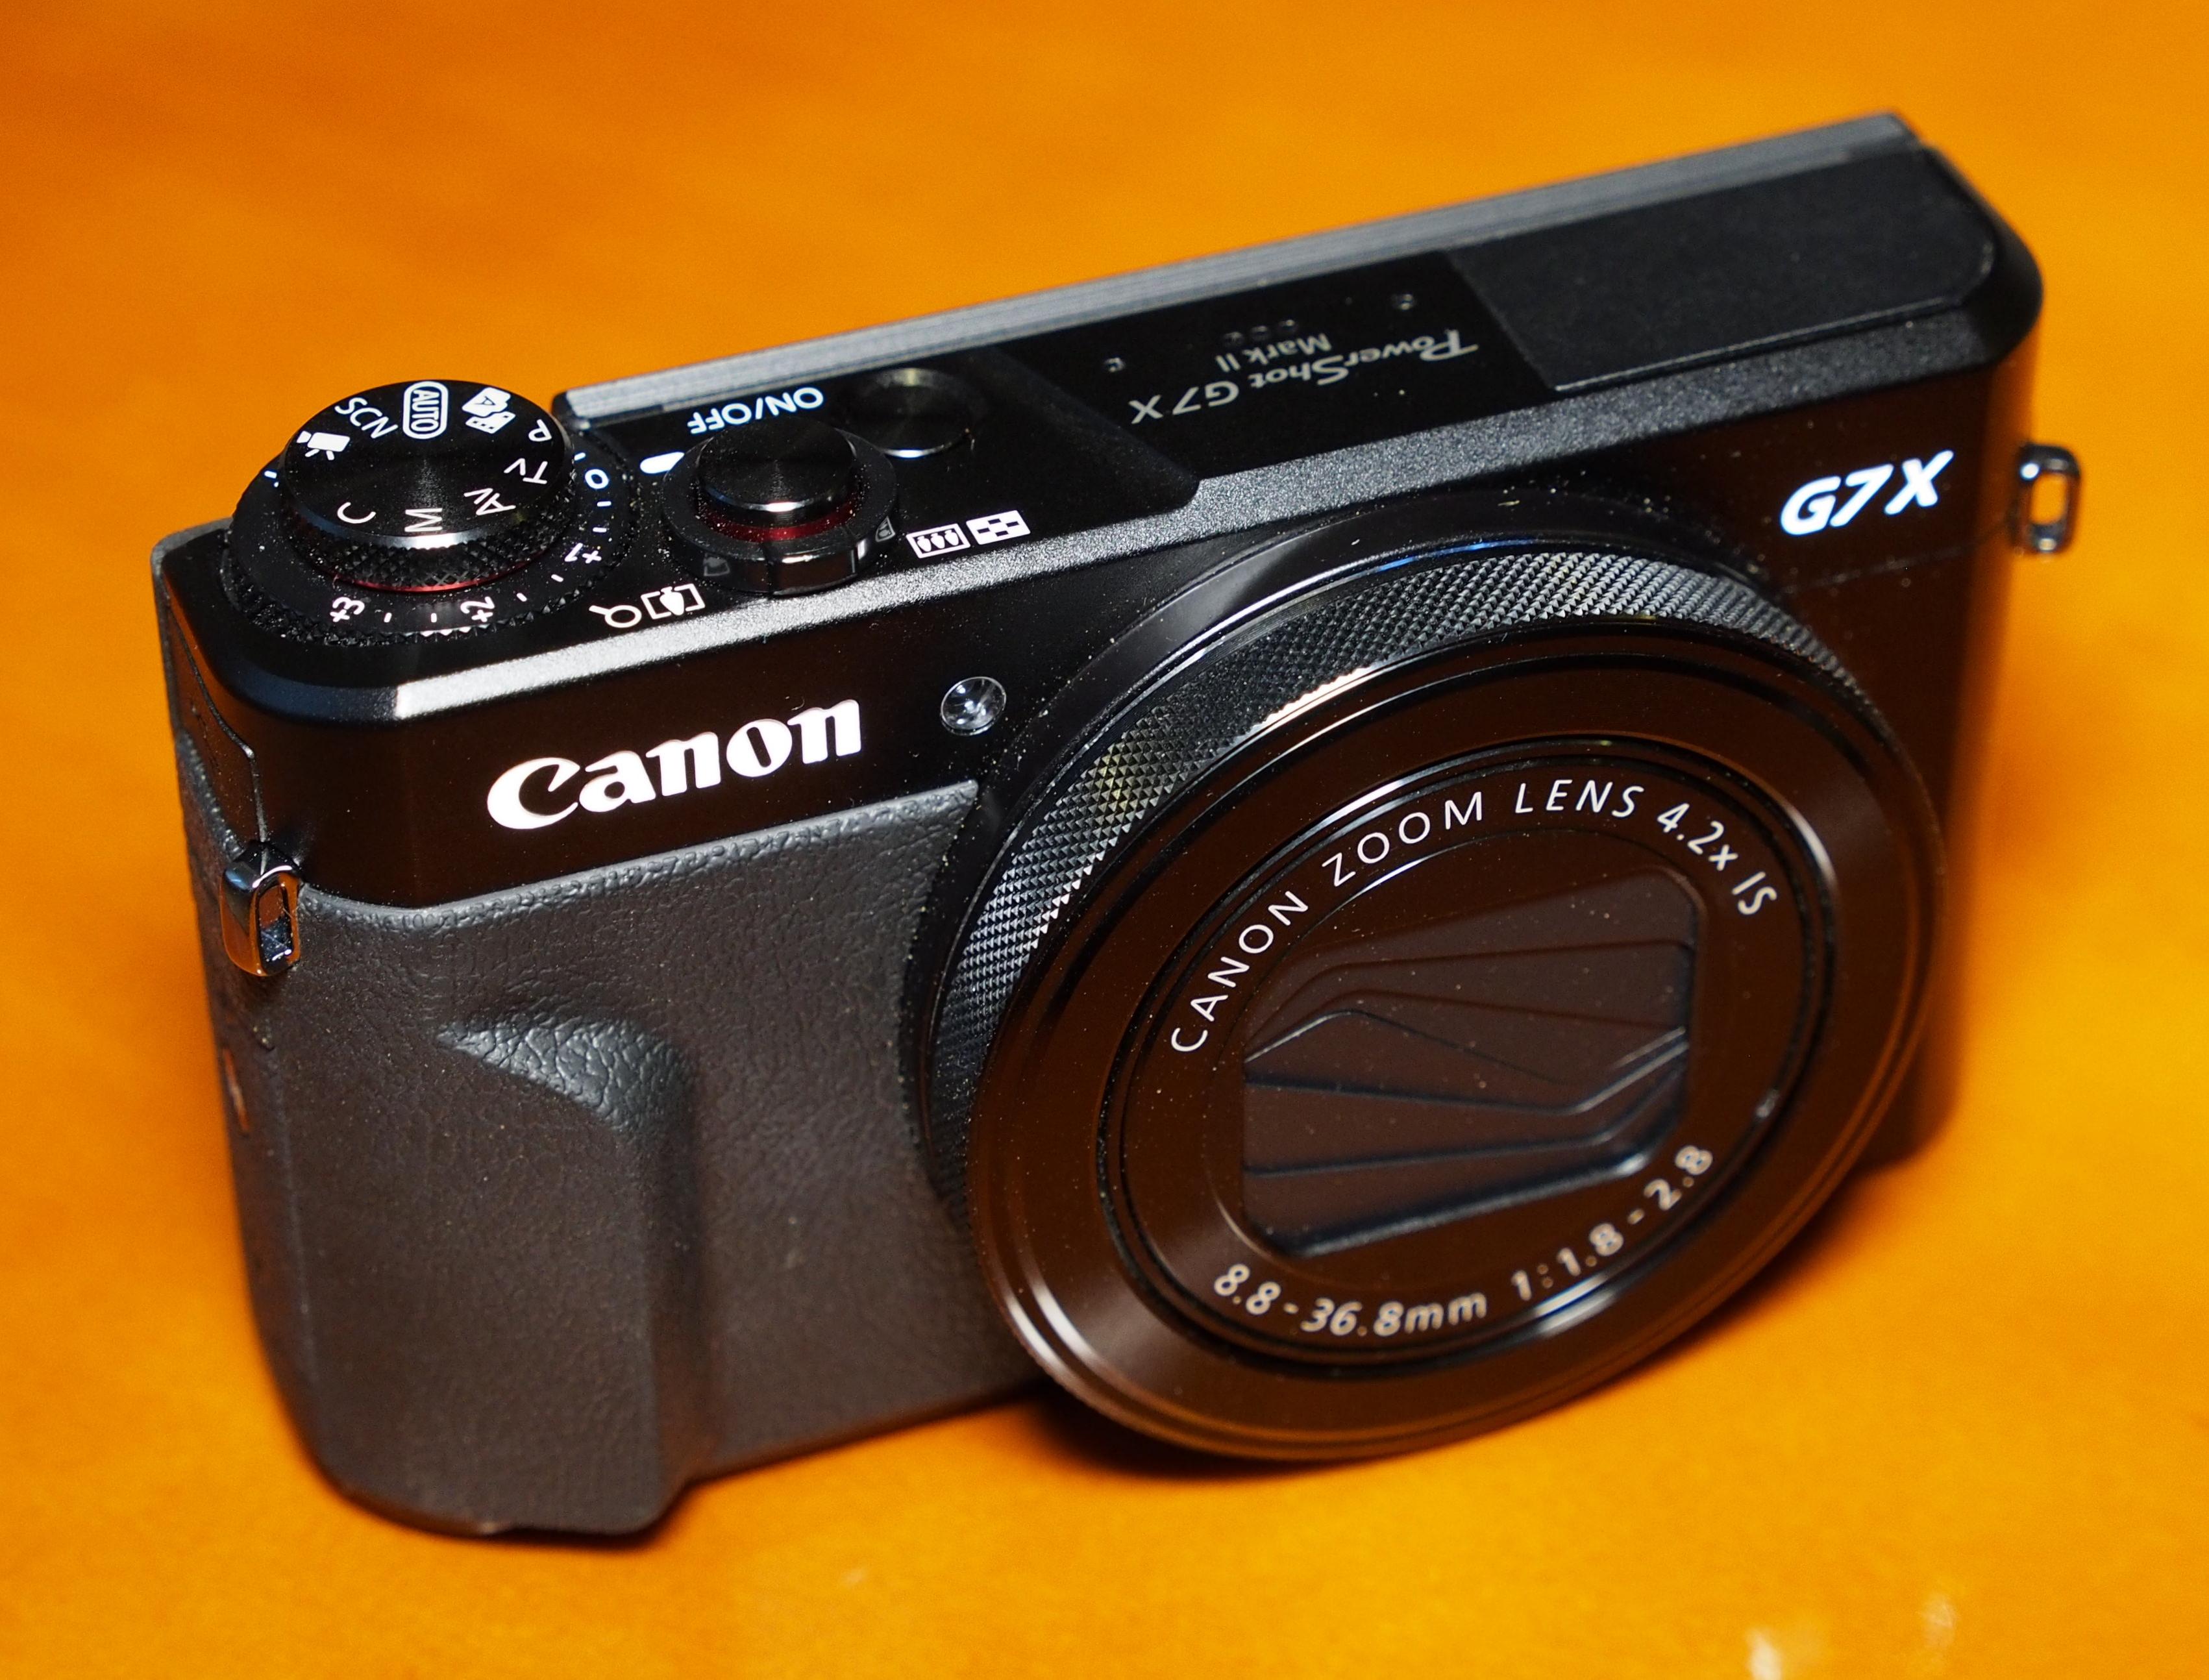 e15a109f6056 Canon Powershot G7 X Mark II Review | ePHOTOzine